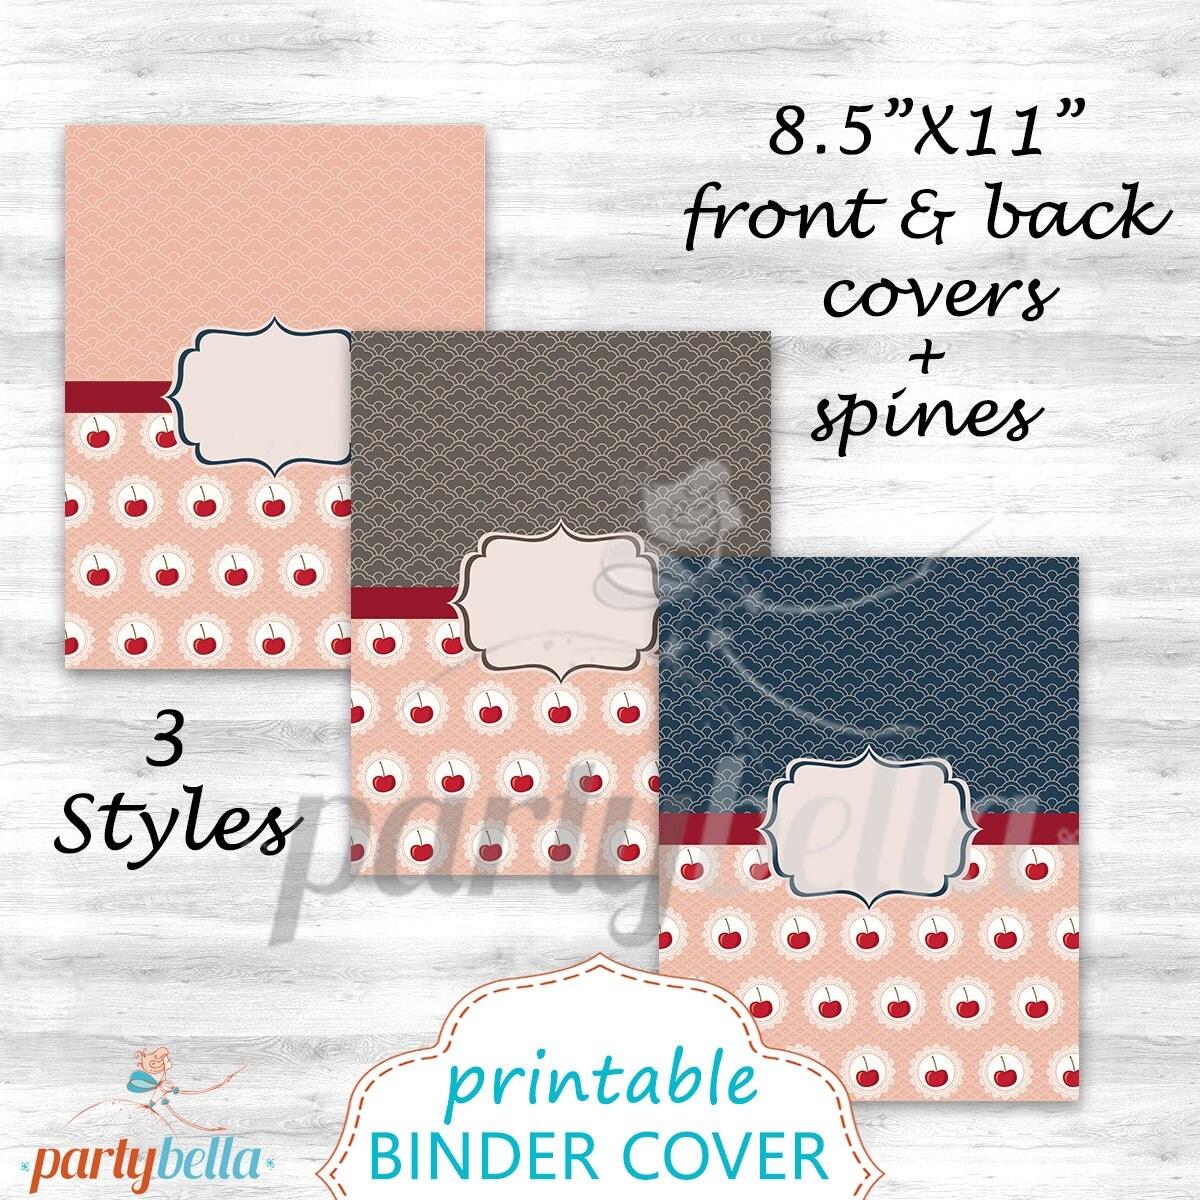 Printable Cherry Binder Cover Set Of 3 8.5x11